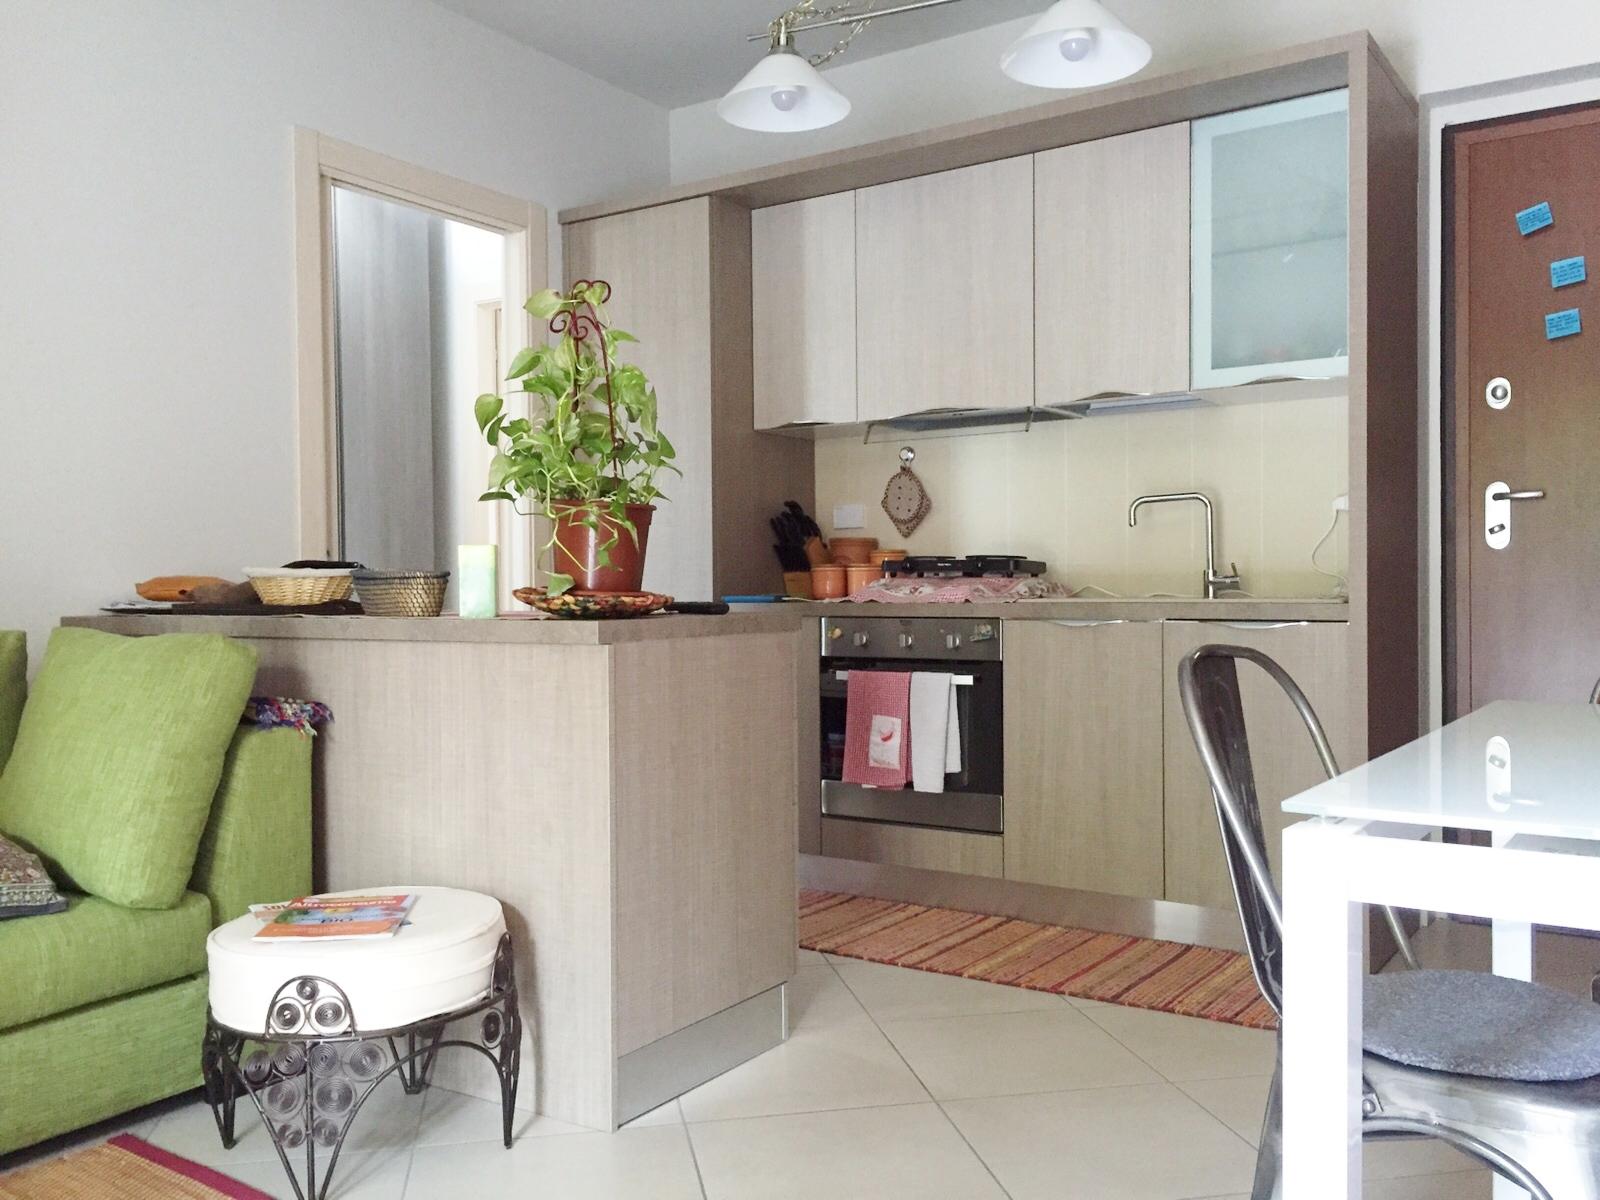 Sala Cucina 25 Mq 3 soluzioni intelligenti per arredare in 45 mq - zeta concept